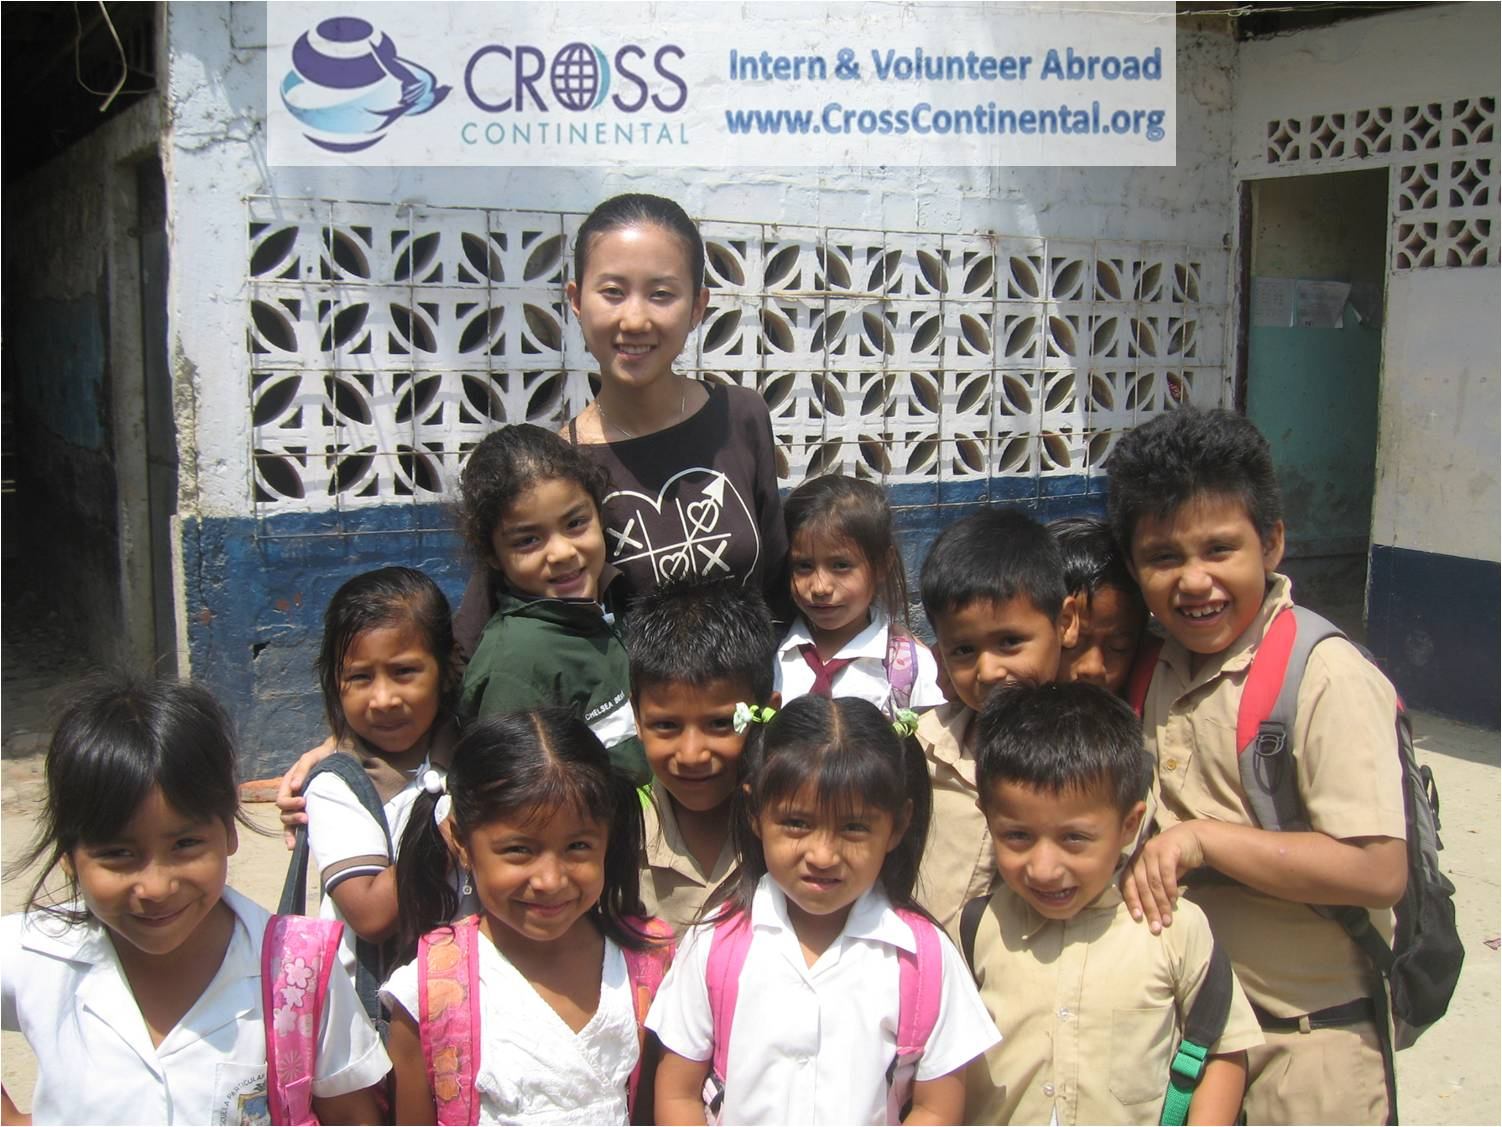 international internships and volunteer abroad-Latin America-Ecuador-112-teaching